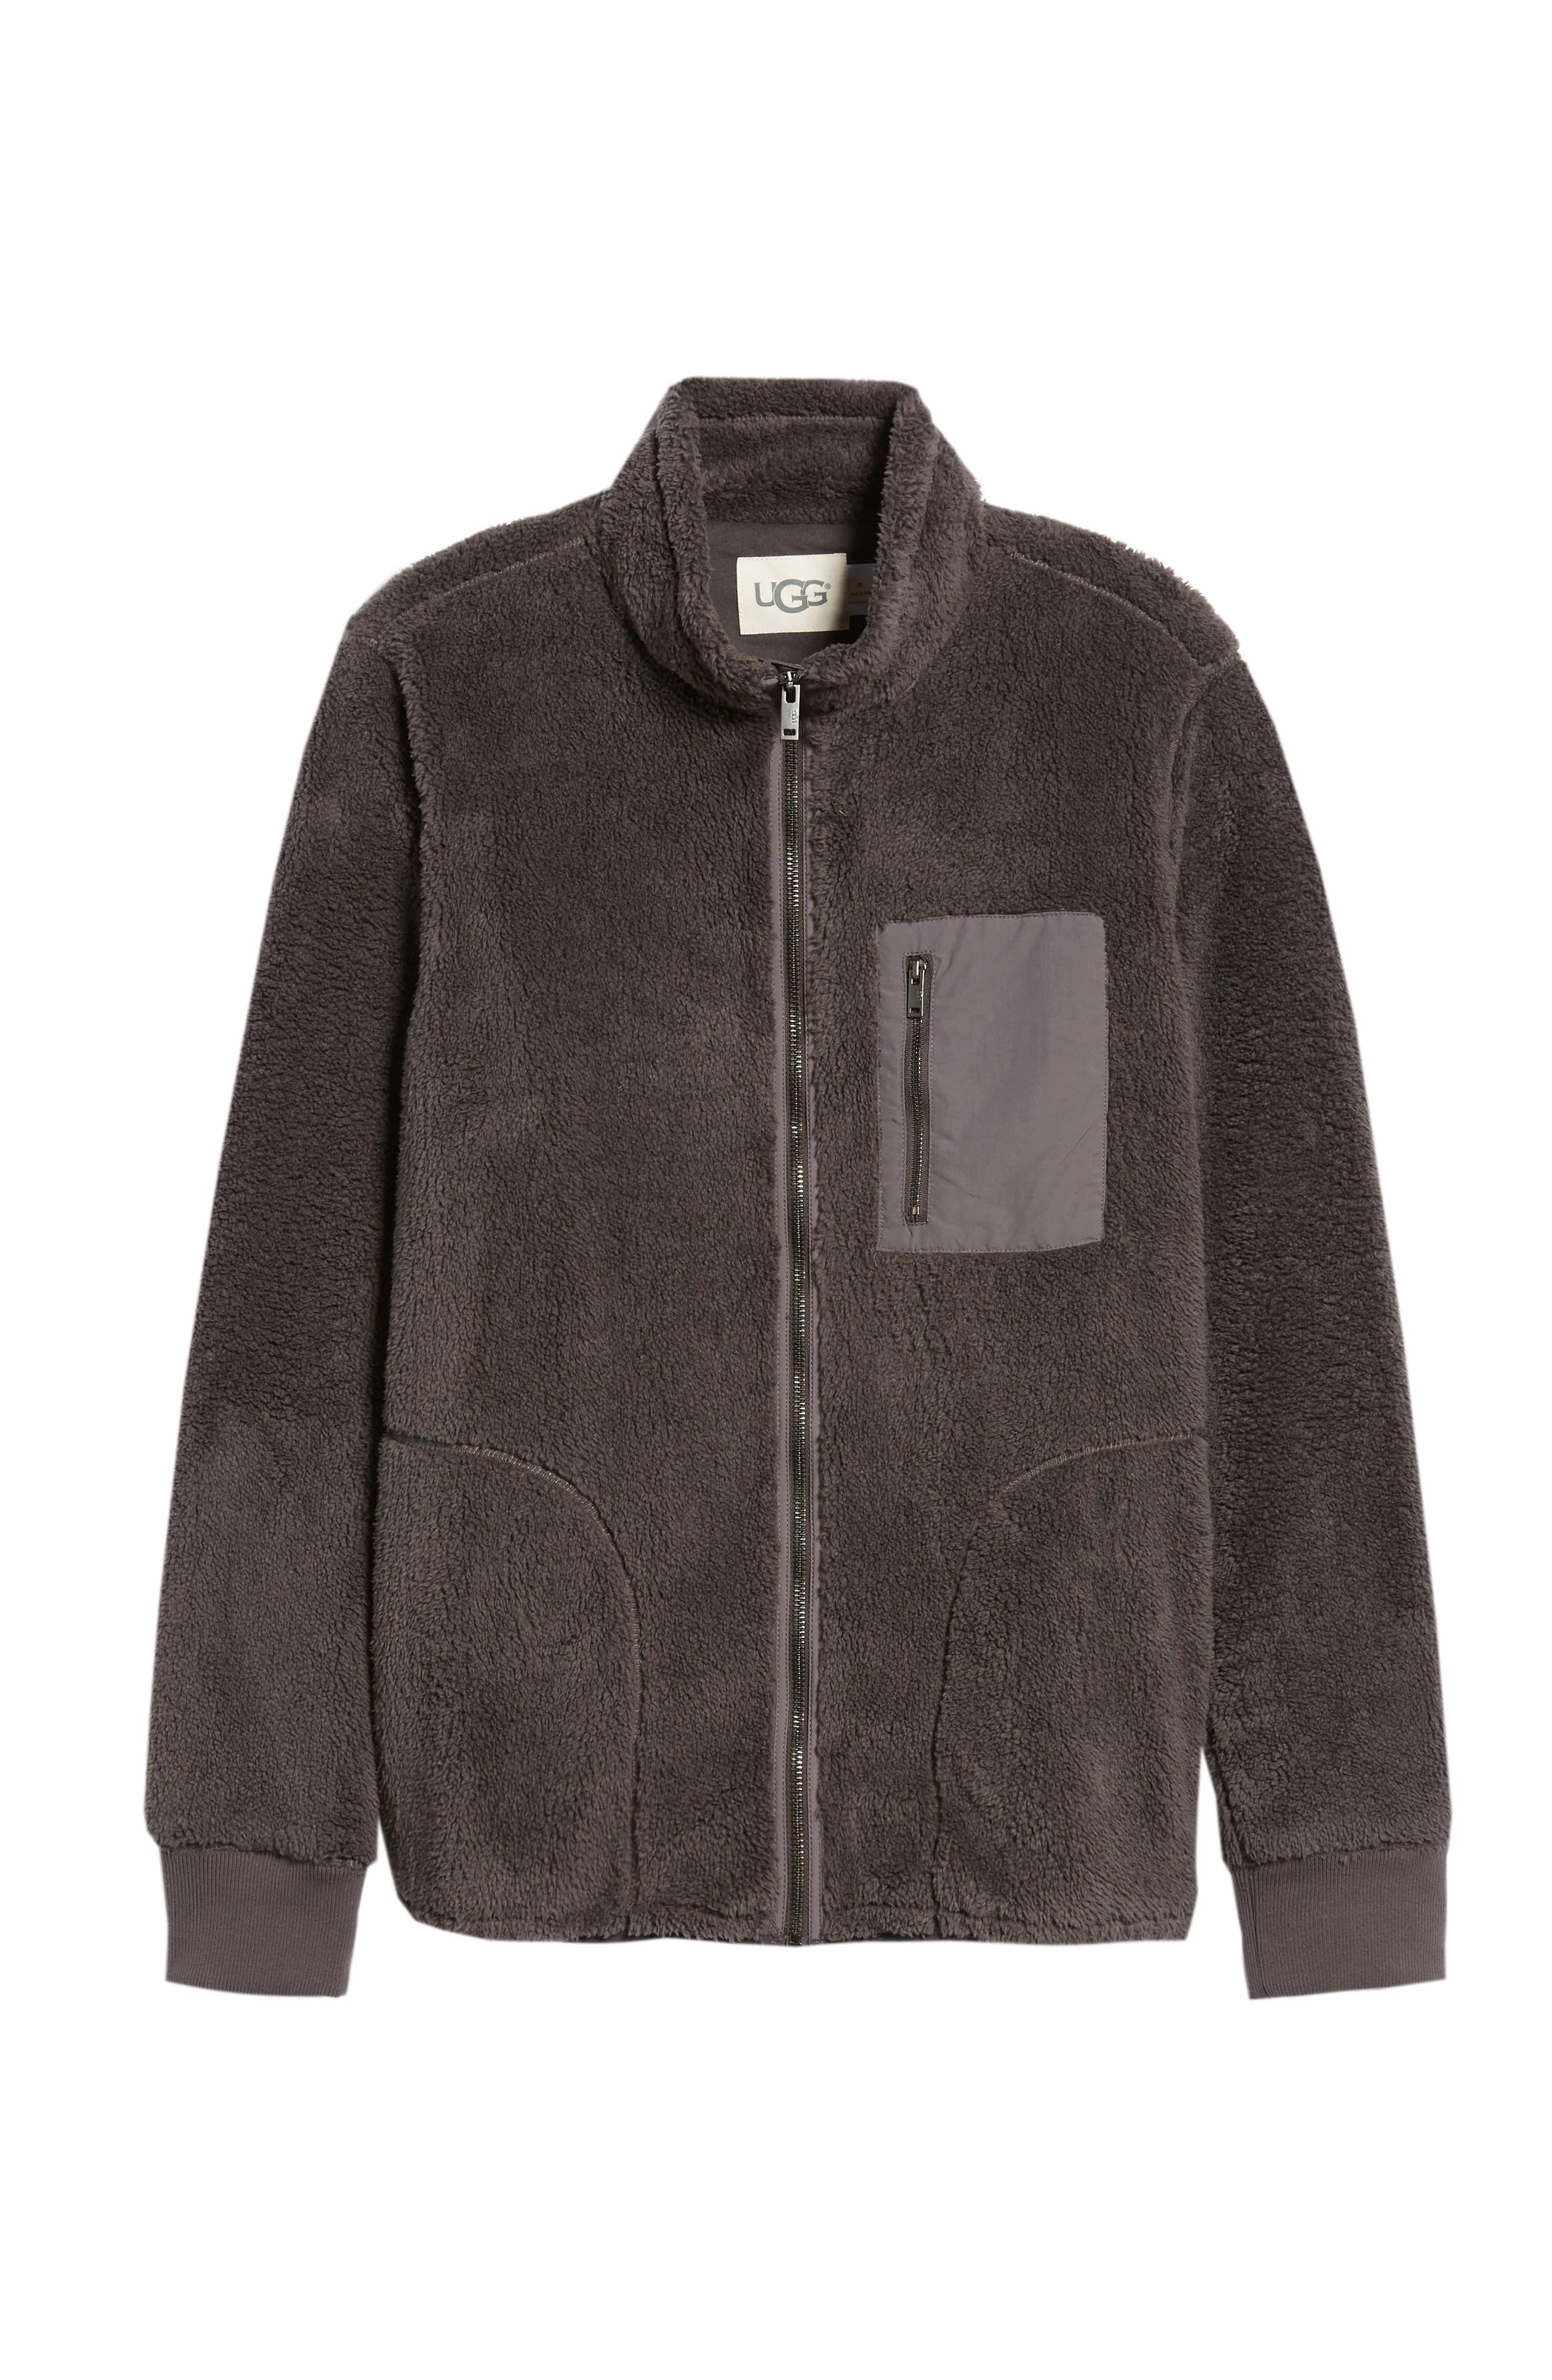 UGG<SUP>®</SUP>, Lucas High Pile Fleece Sweater Jacket, Alternate thumbnail 7, color, CHARCOAL